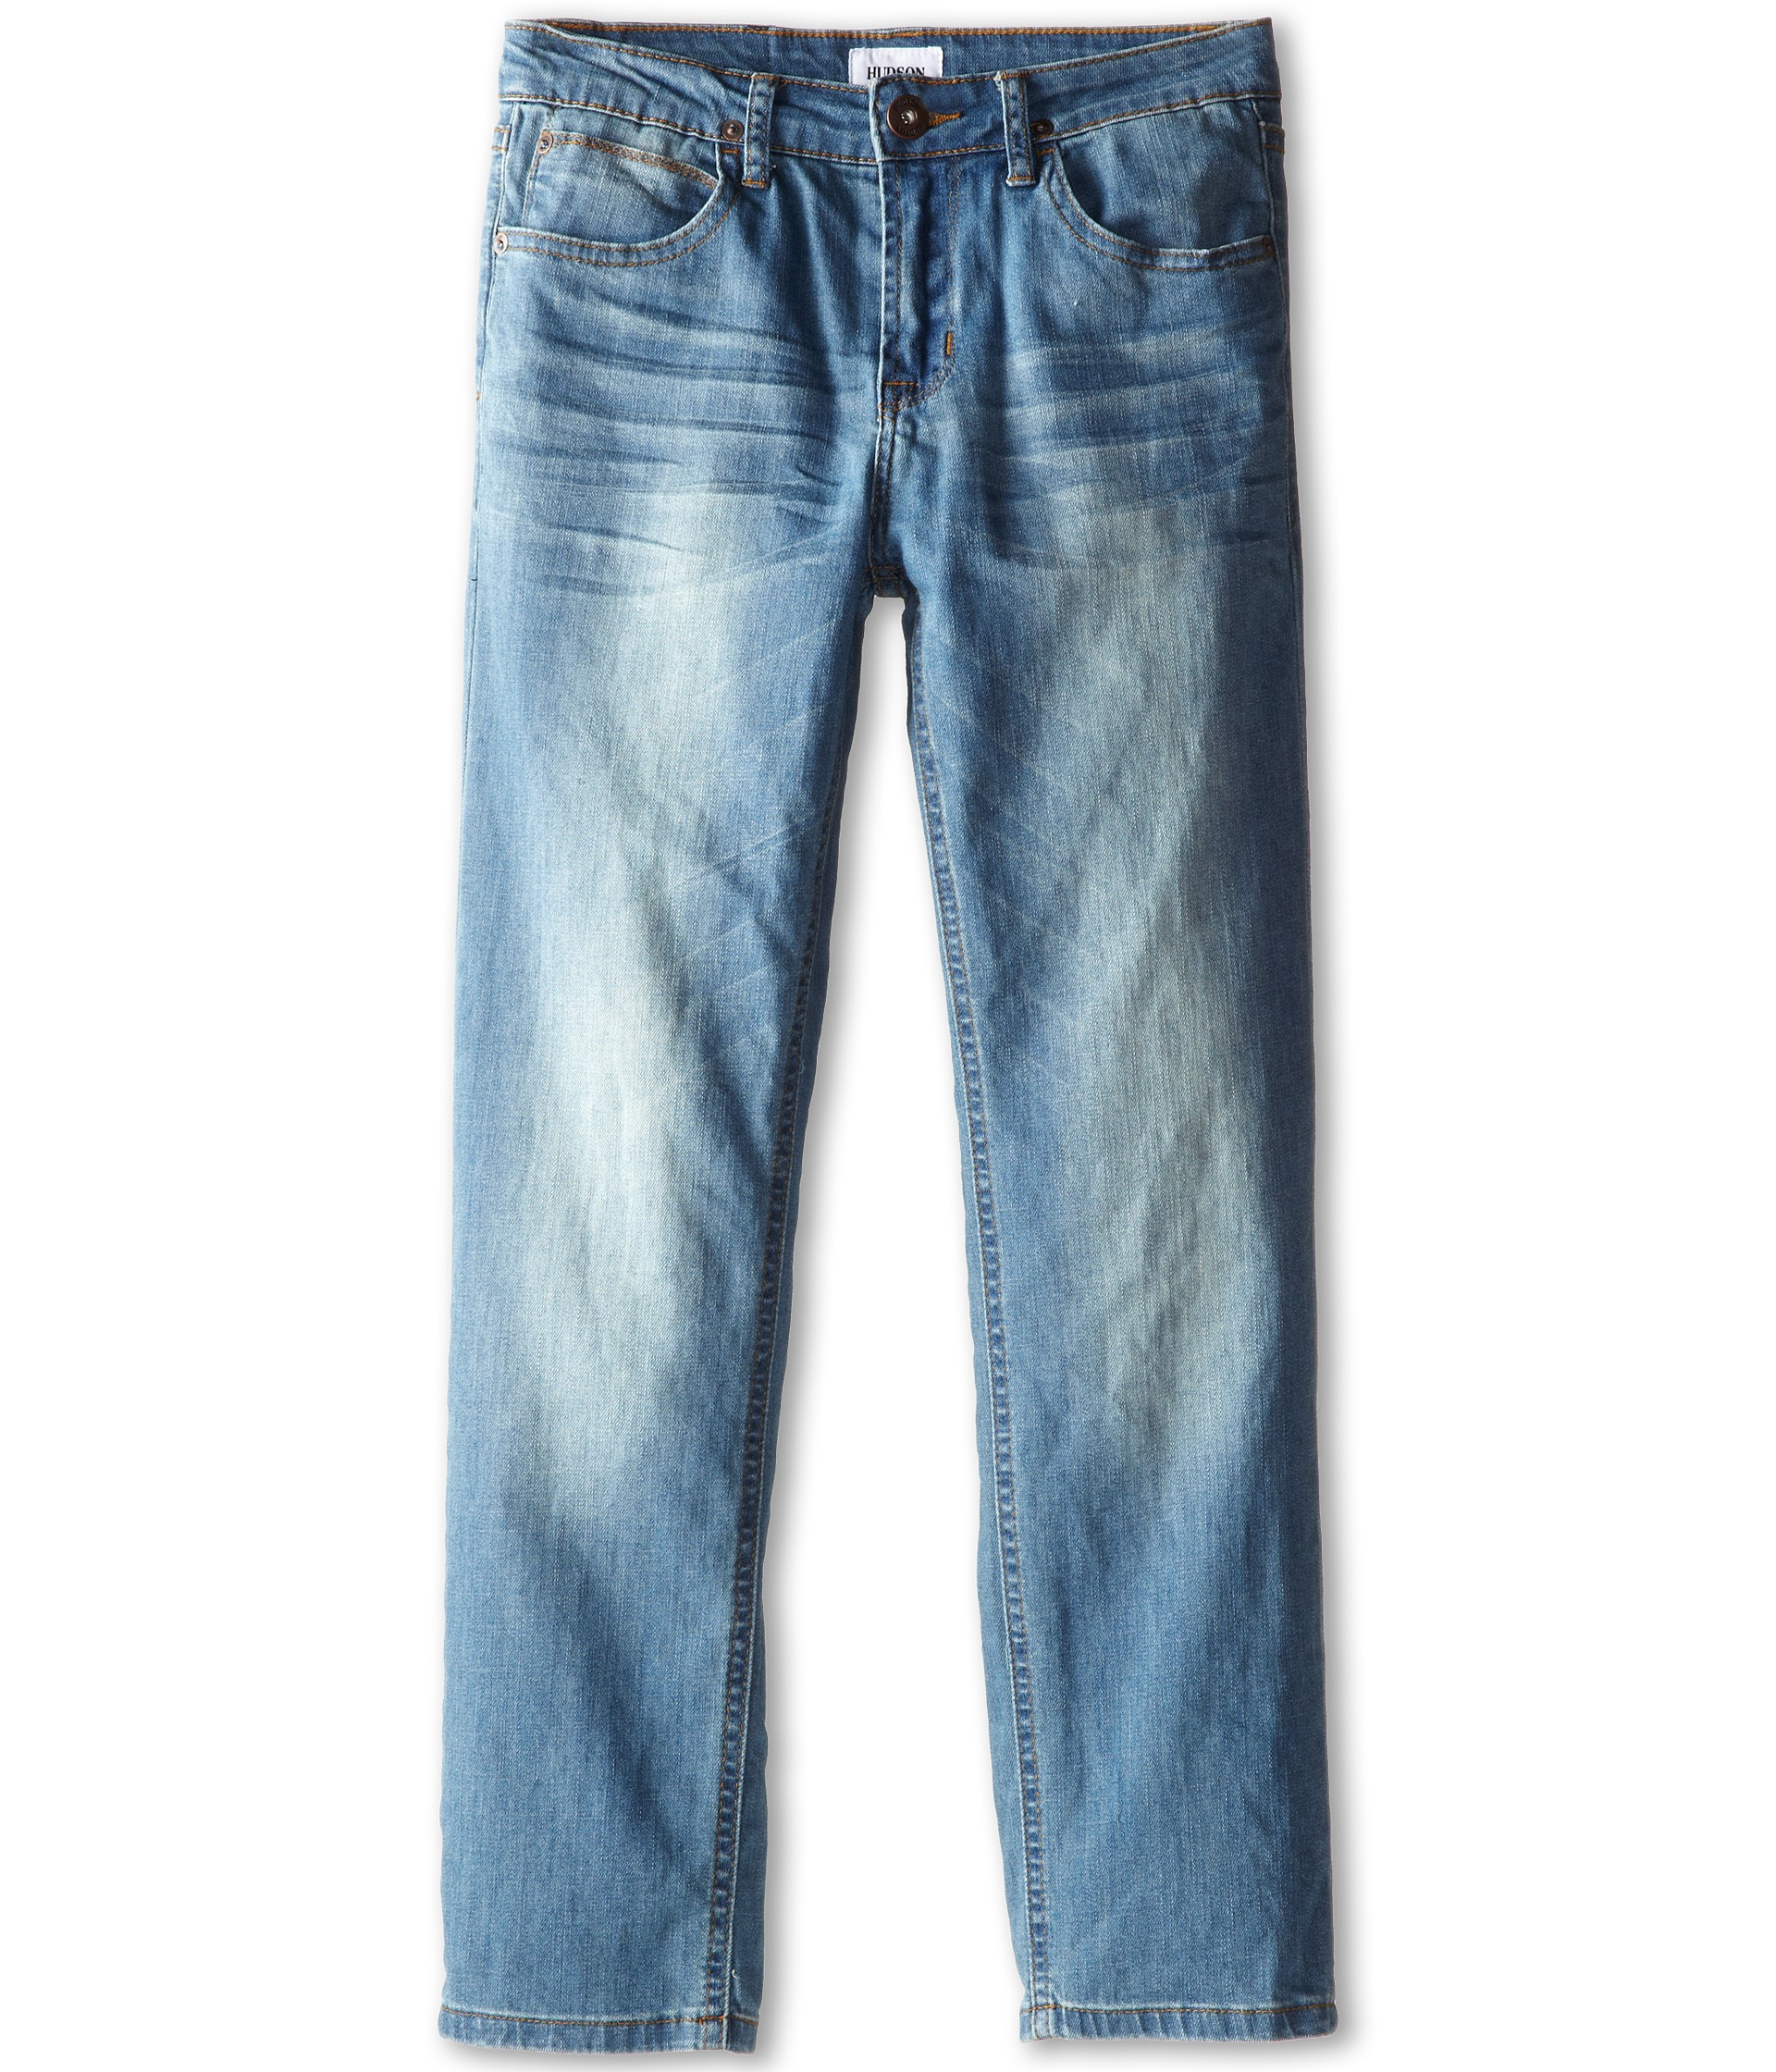 jeans depth of - photo #9